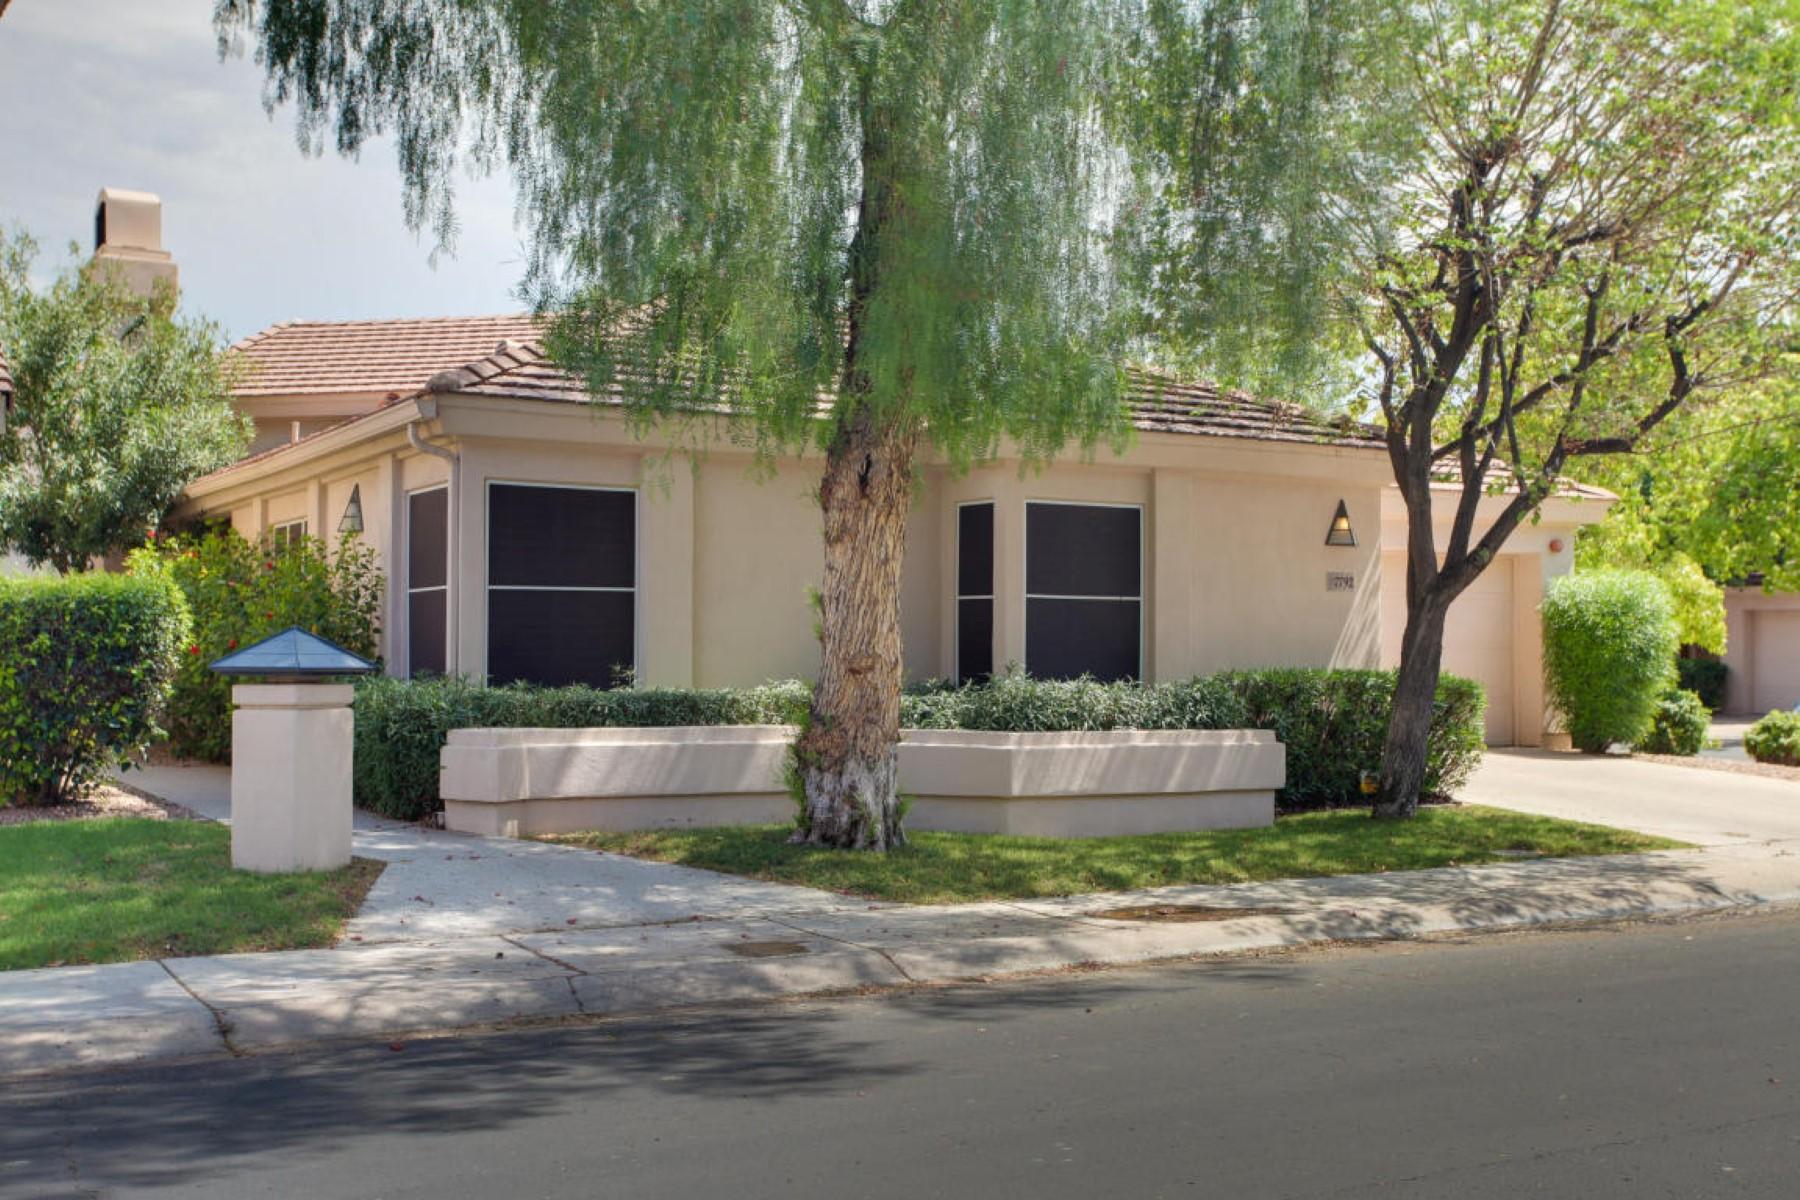 獨棟家庭住宅 為 出售 在 Meticulously maintained home. 7792 E Foxmore Ln Scottsdale, 亞利桑那州 85258 美國